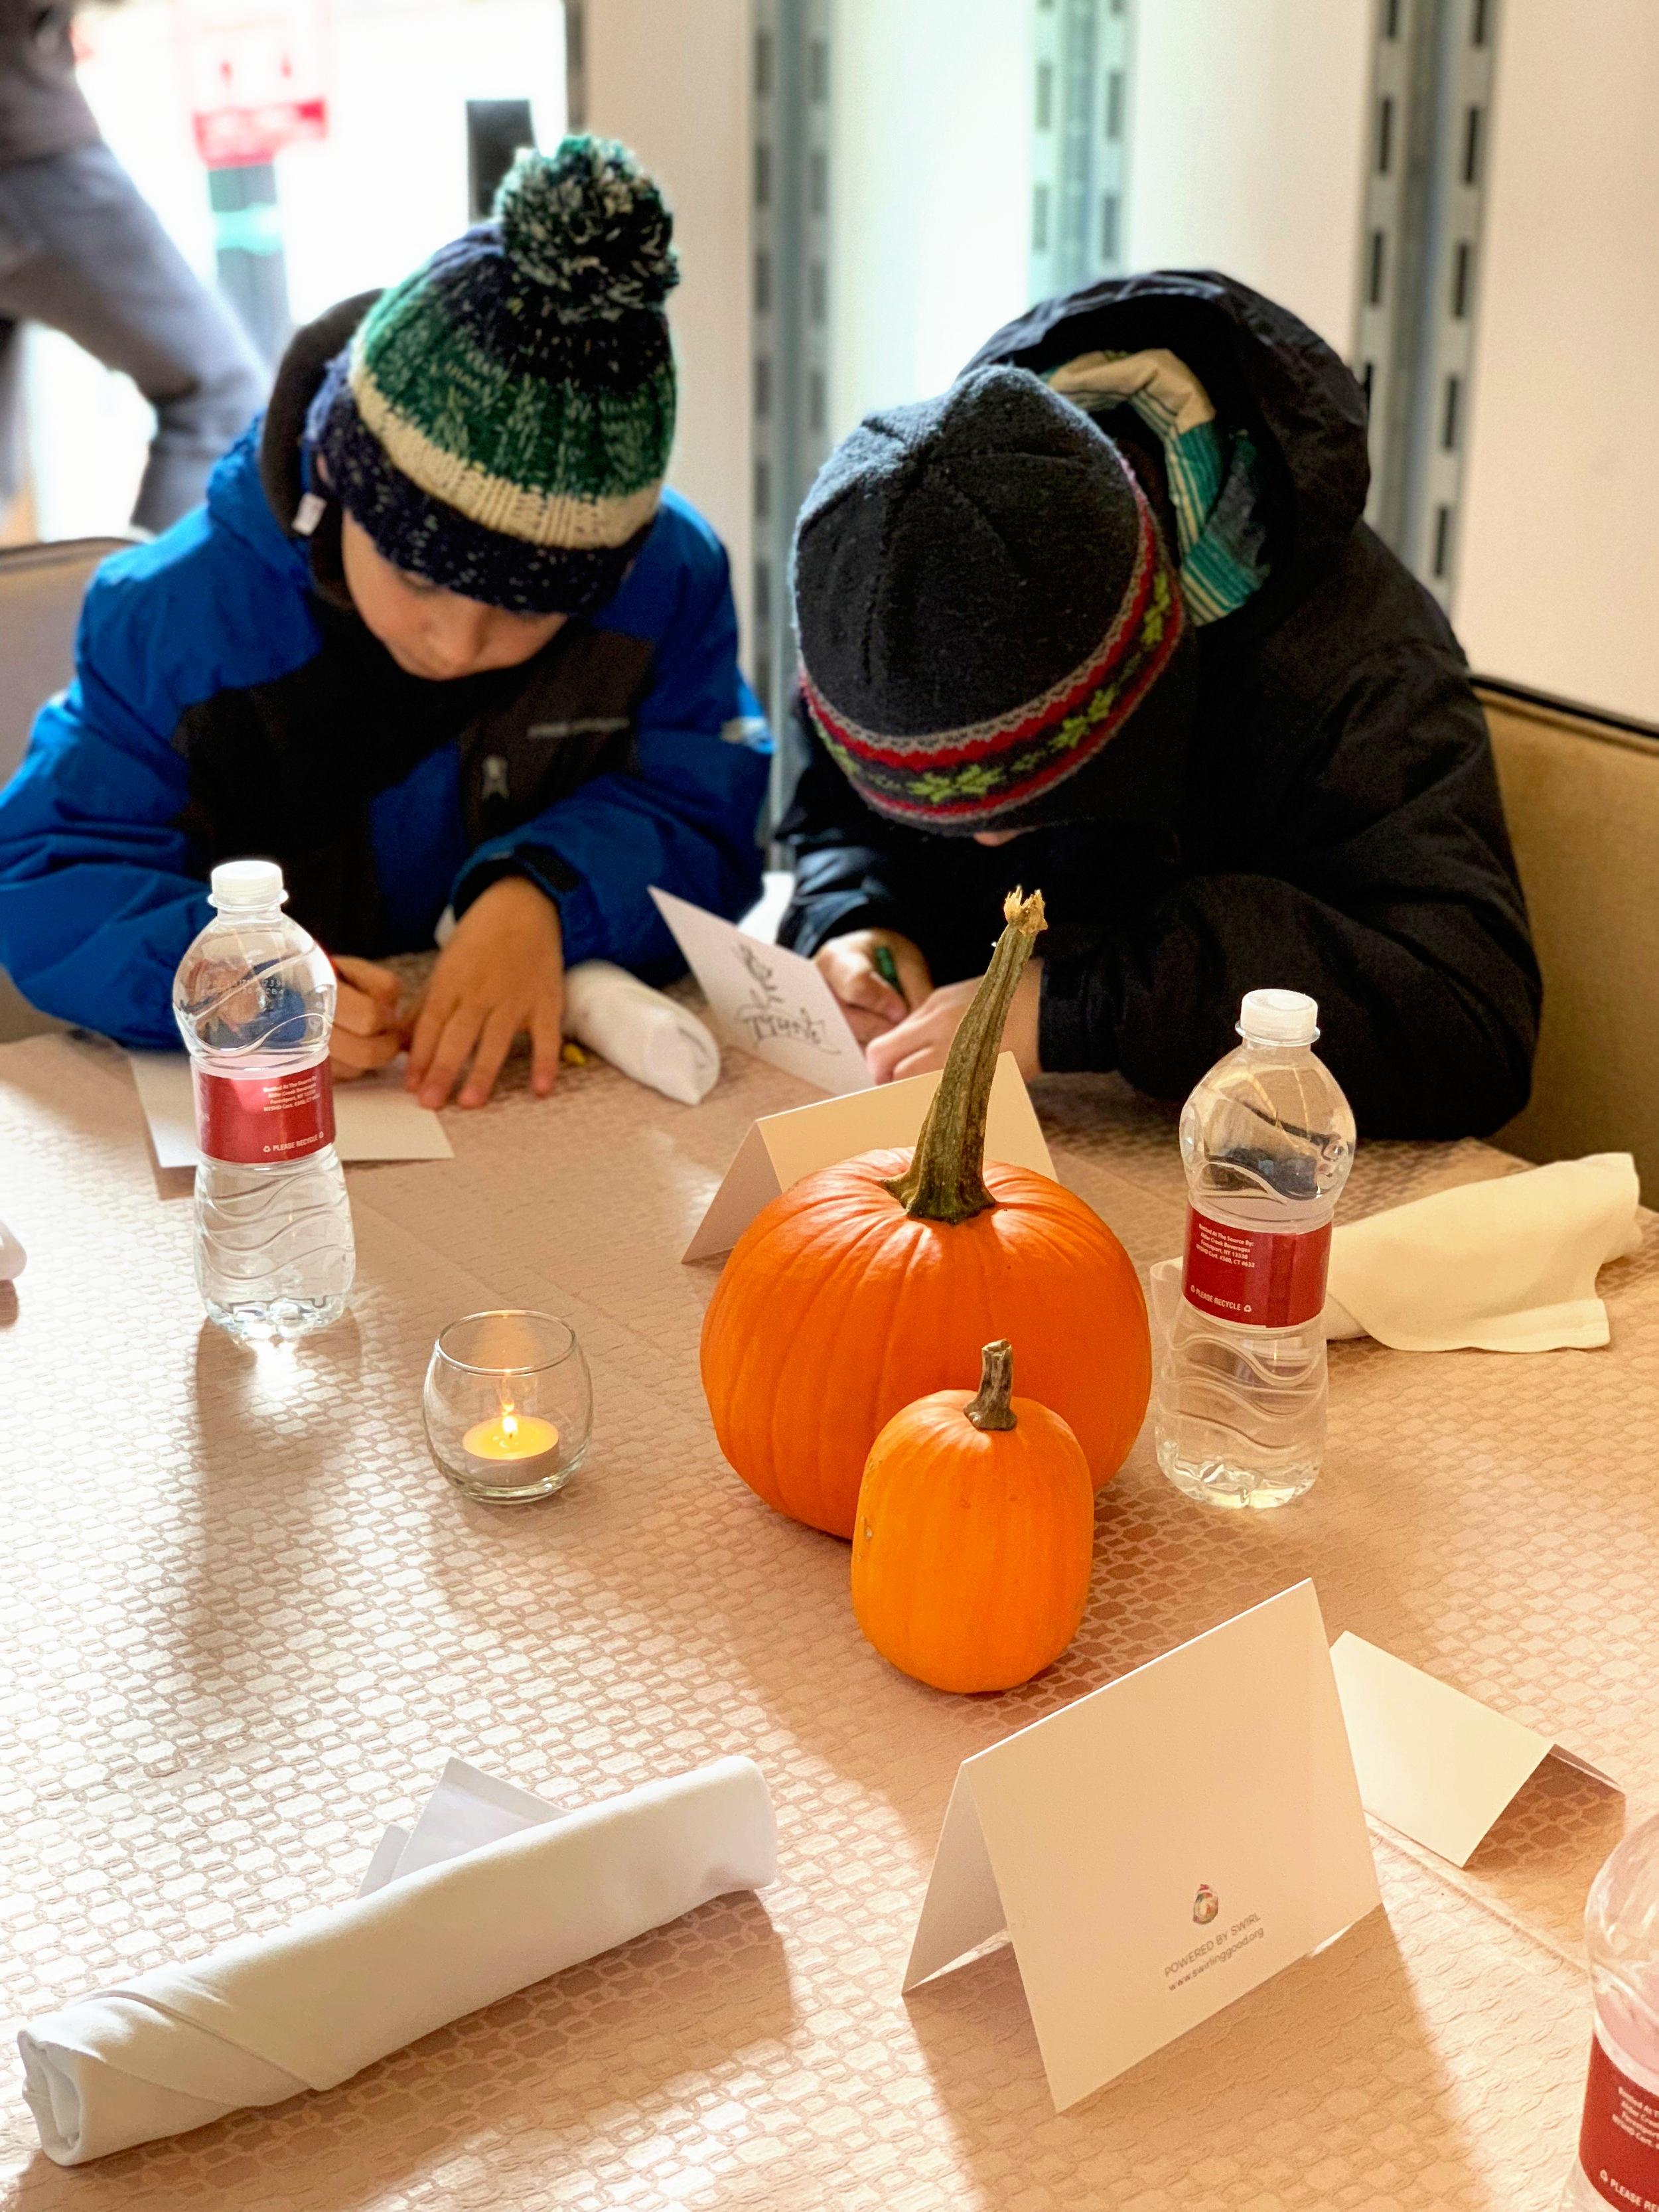 Thanksgiving-WriteCards-GiveThanks-FourSeasons-DC.jpg